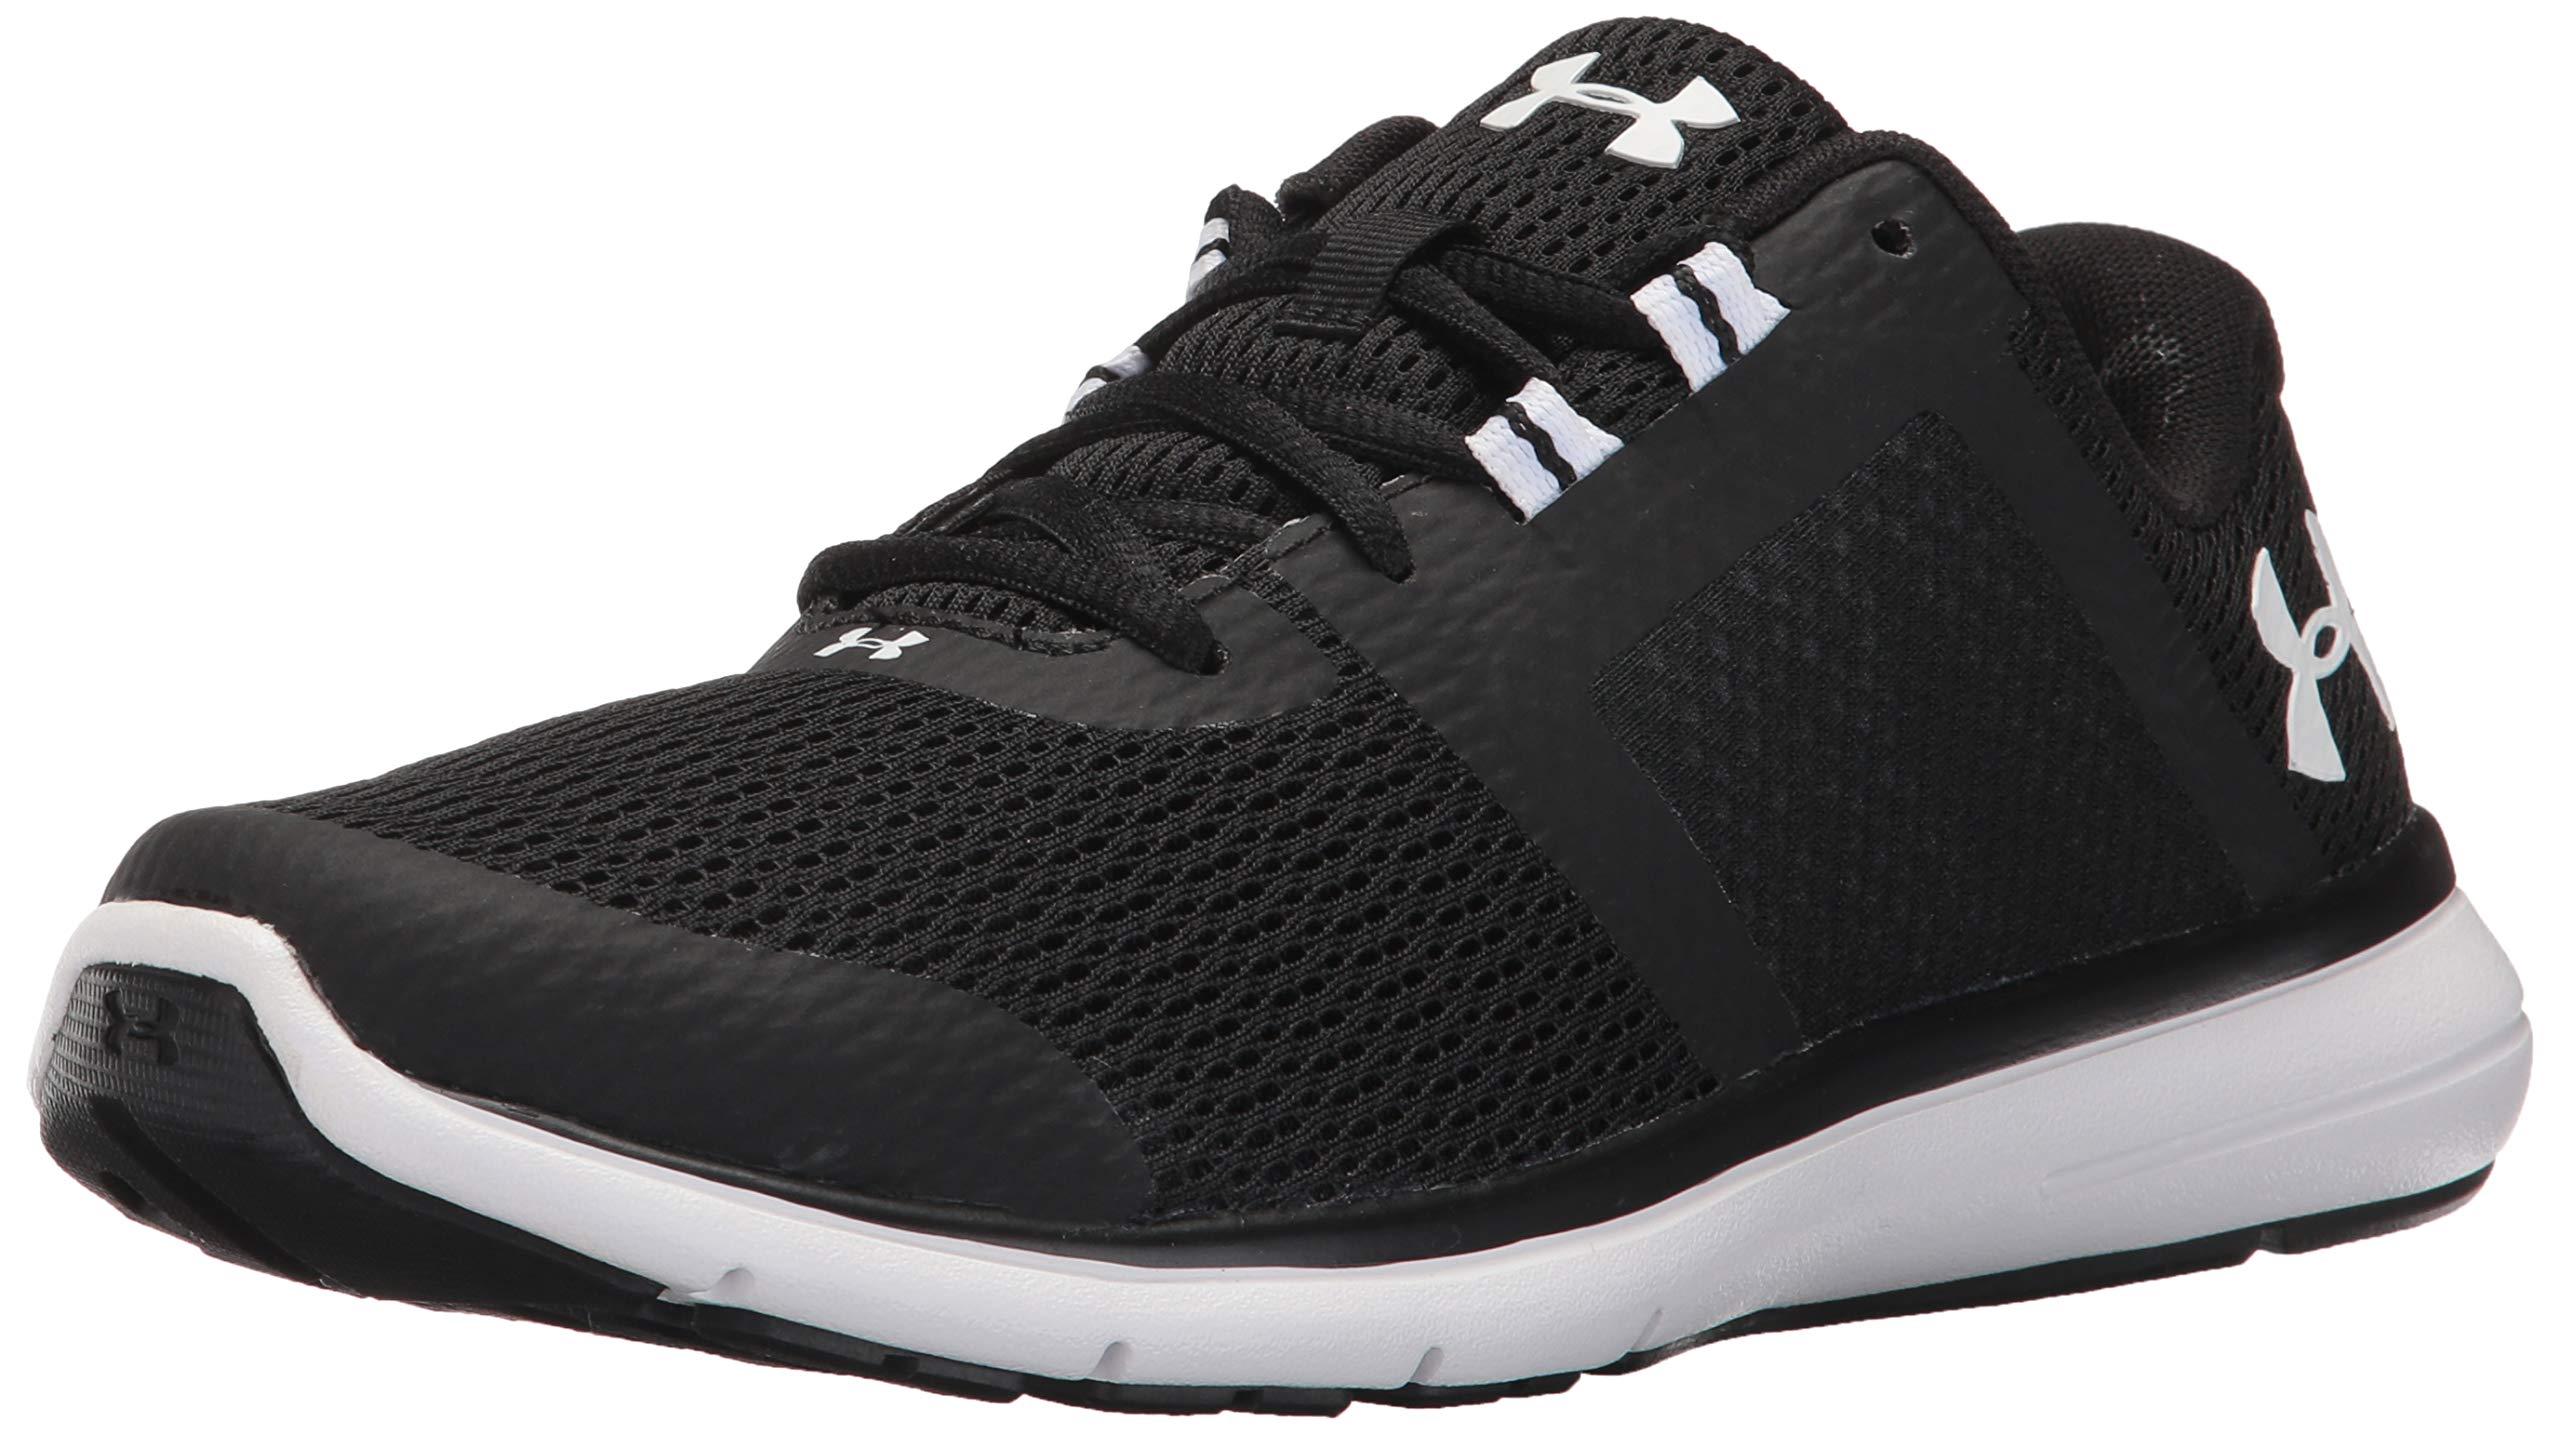 Under Armour Women's Fuse FST Running Shoe, Black